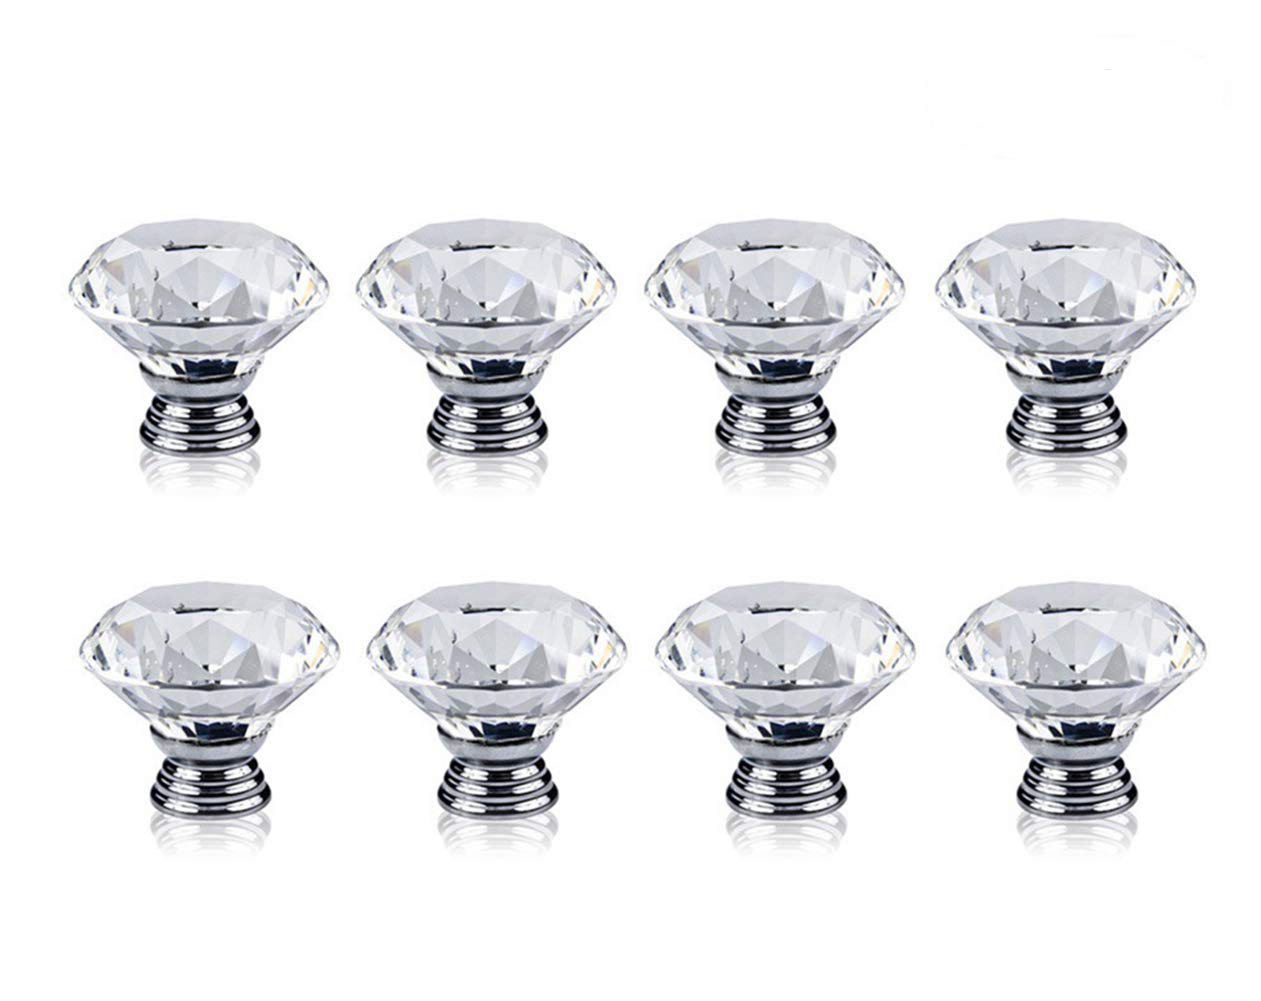 KINGSEVEN Pack of 8 Transparent Diamond Shape Crystal Door Knob, 30mm Silvery Pull Handle for Cabinet, Drawer, Bin, Dresser, Cupboard, Wardrobe